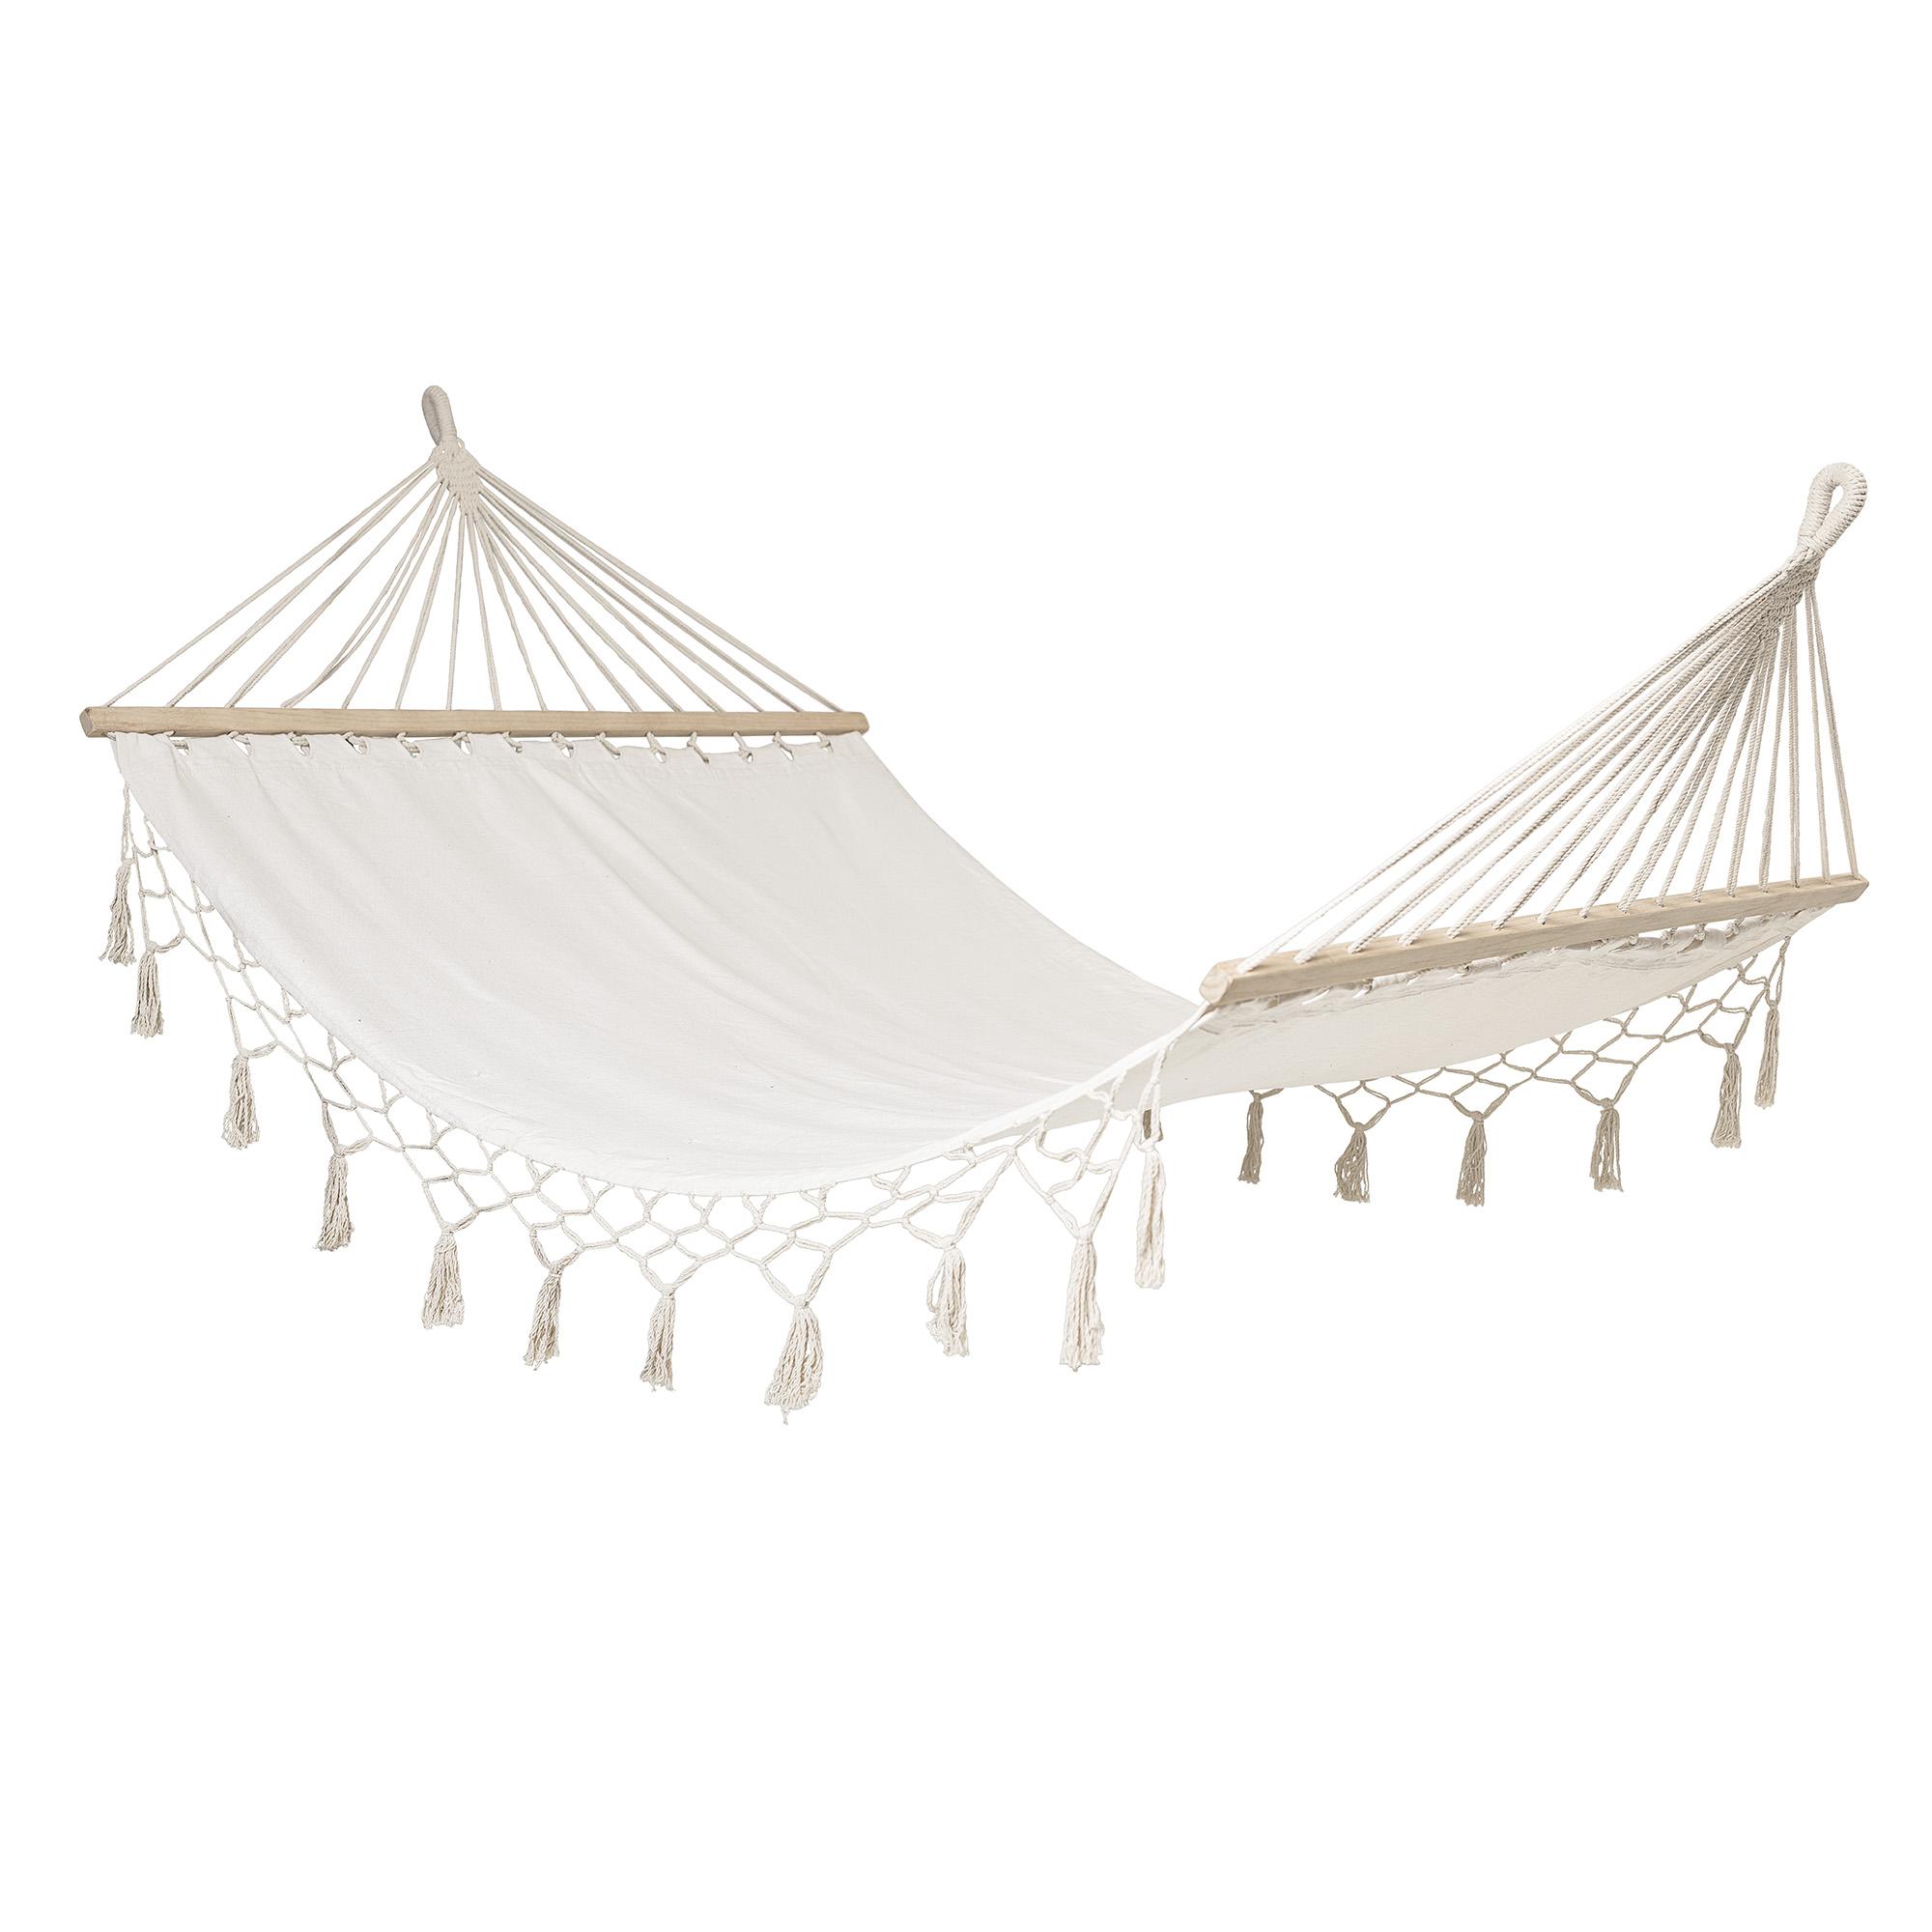 hanging chair kuwait revolving wheel price in pakistan moltazdesignshop hammock natural cotton